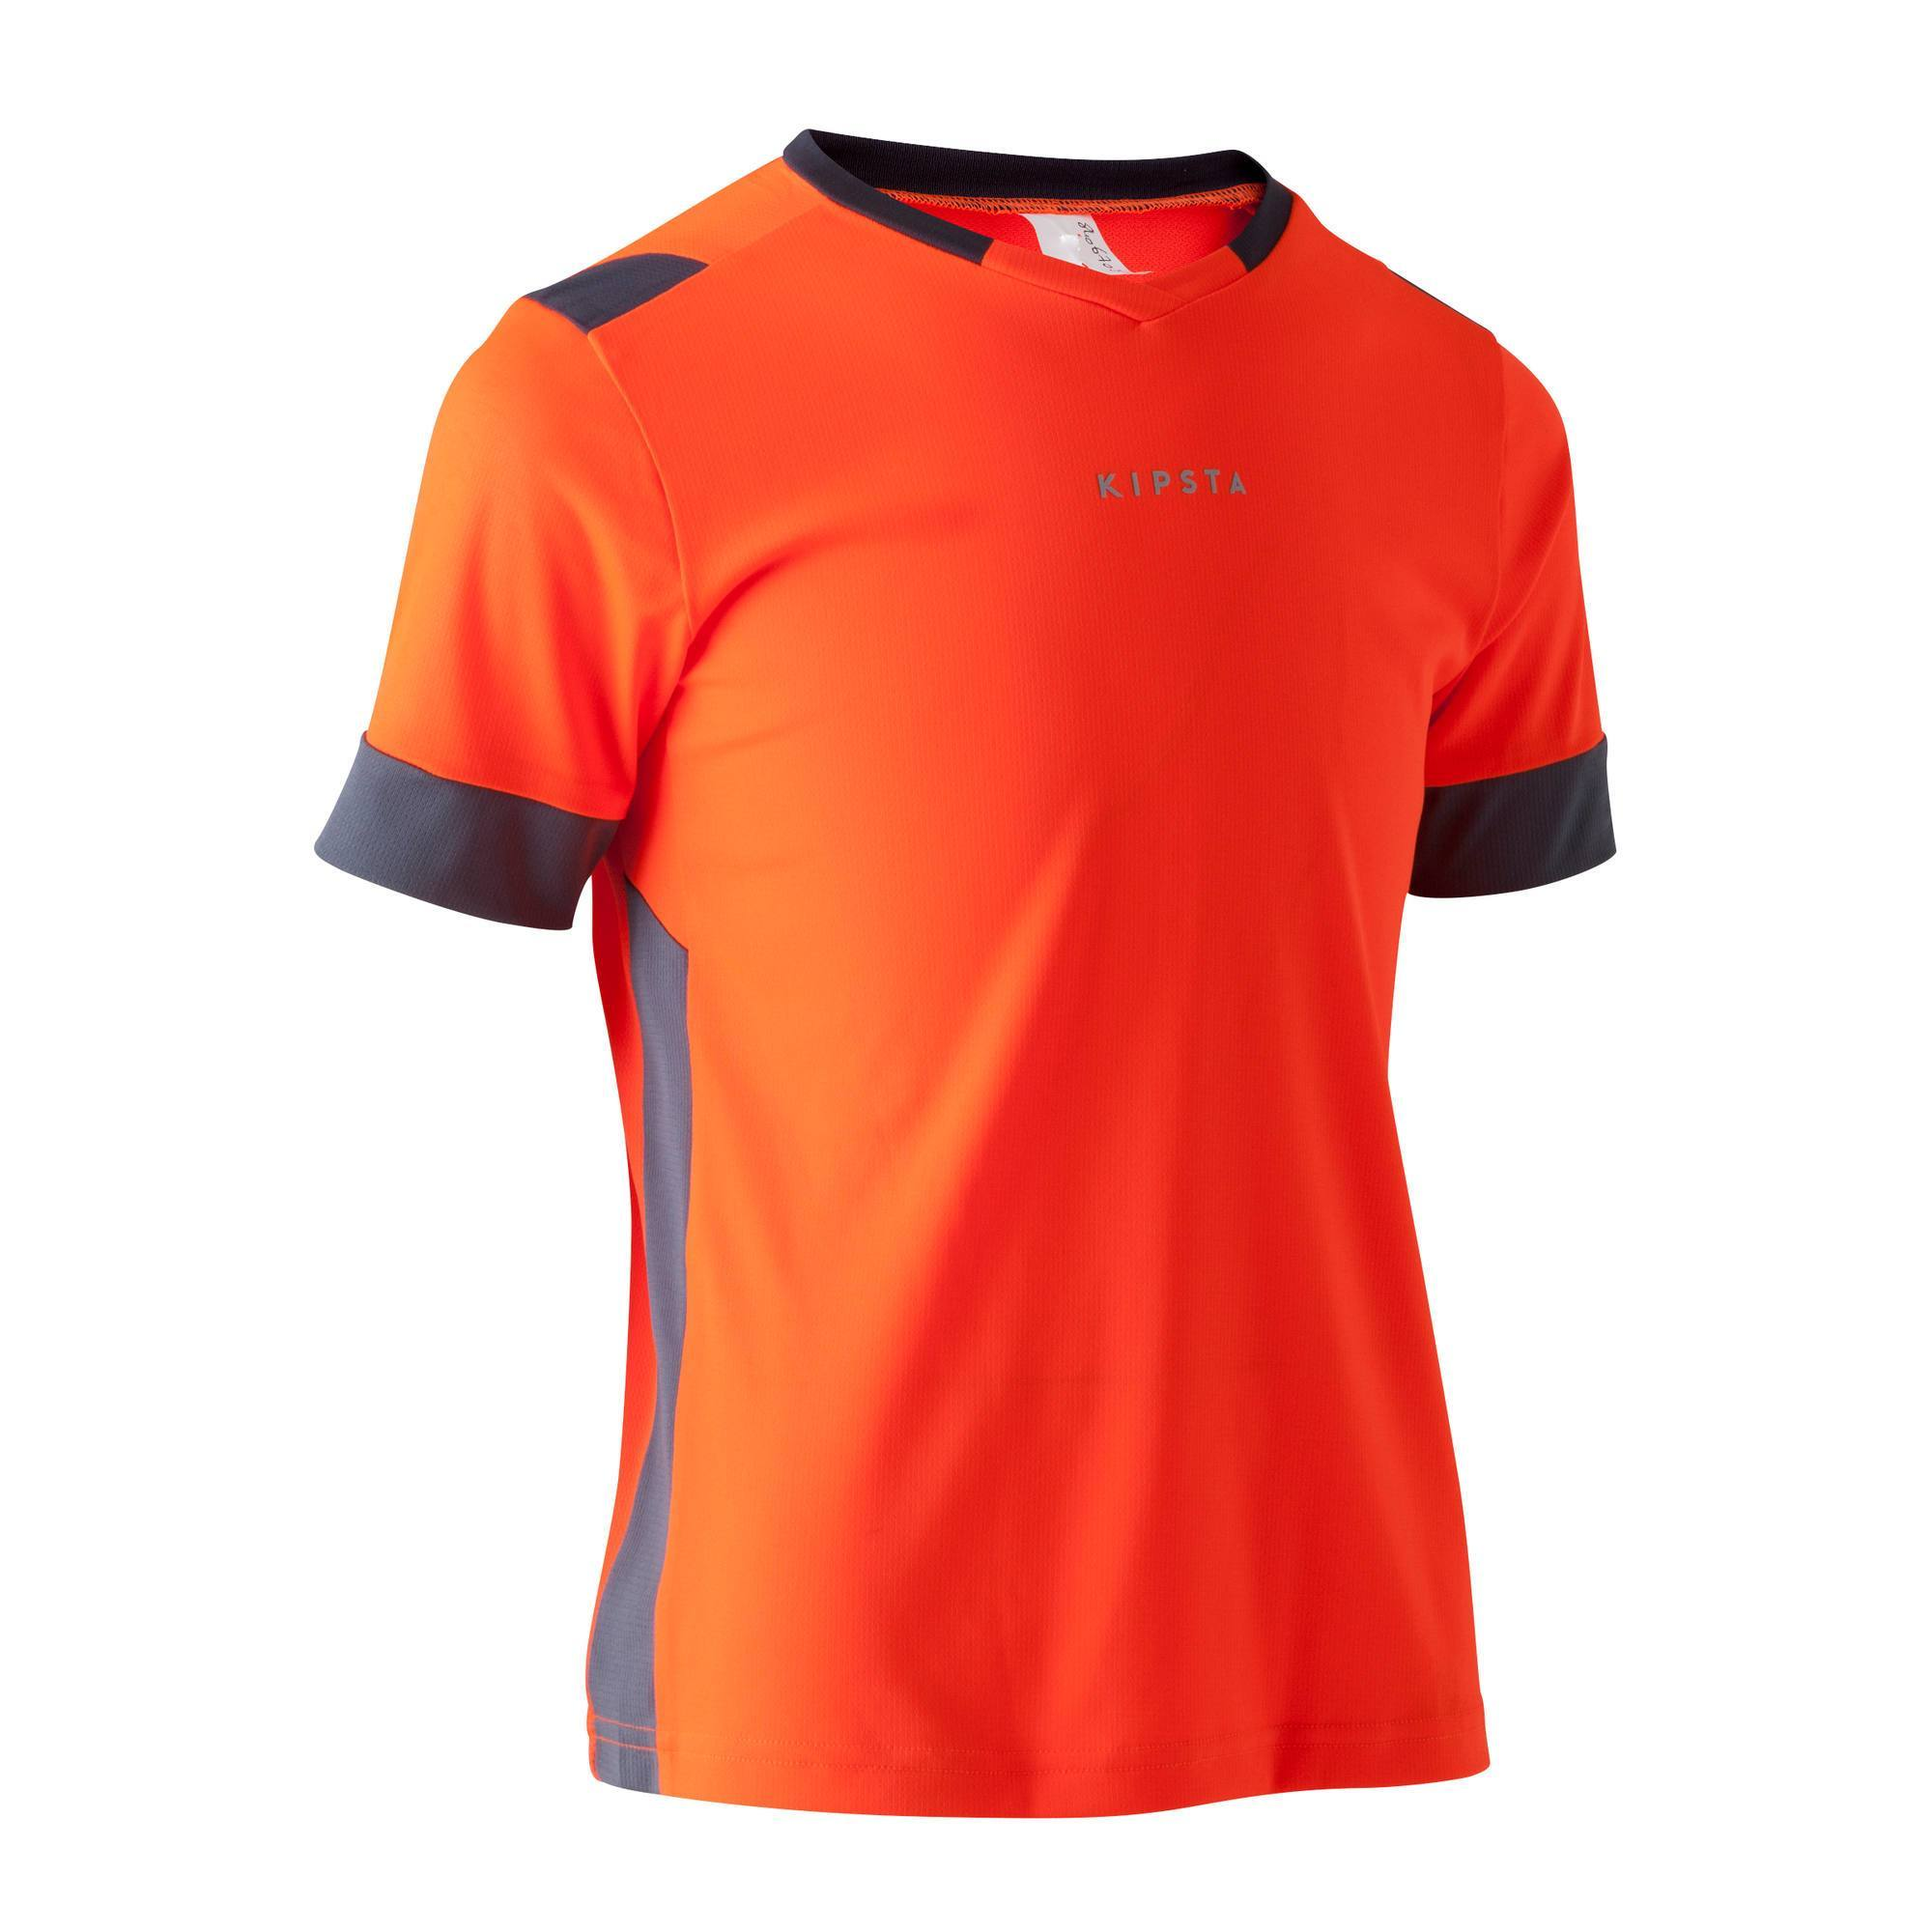 Maillot de football enfant F500 orange